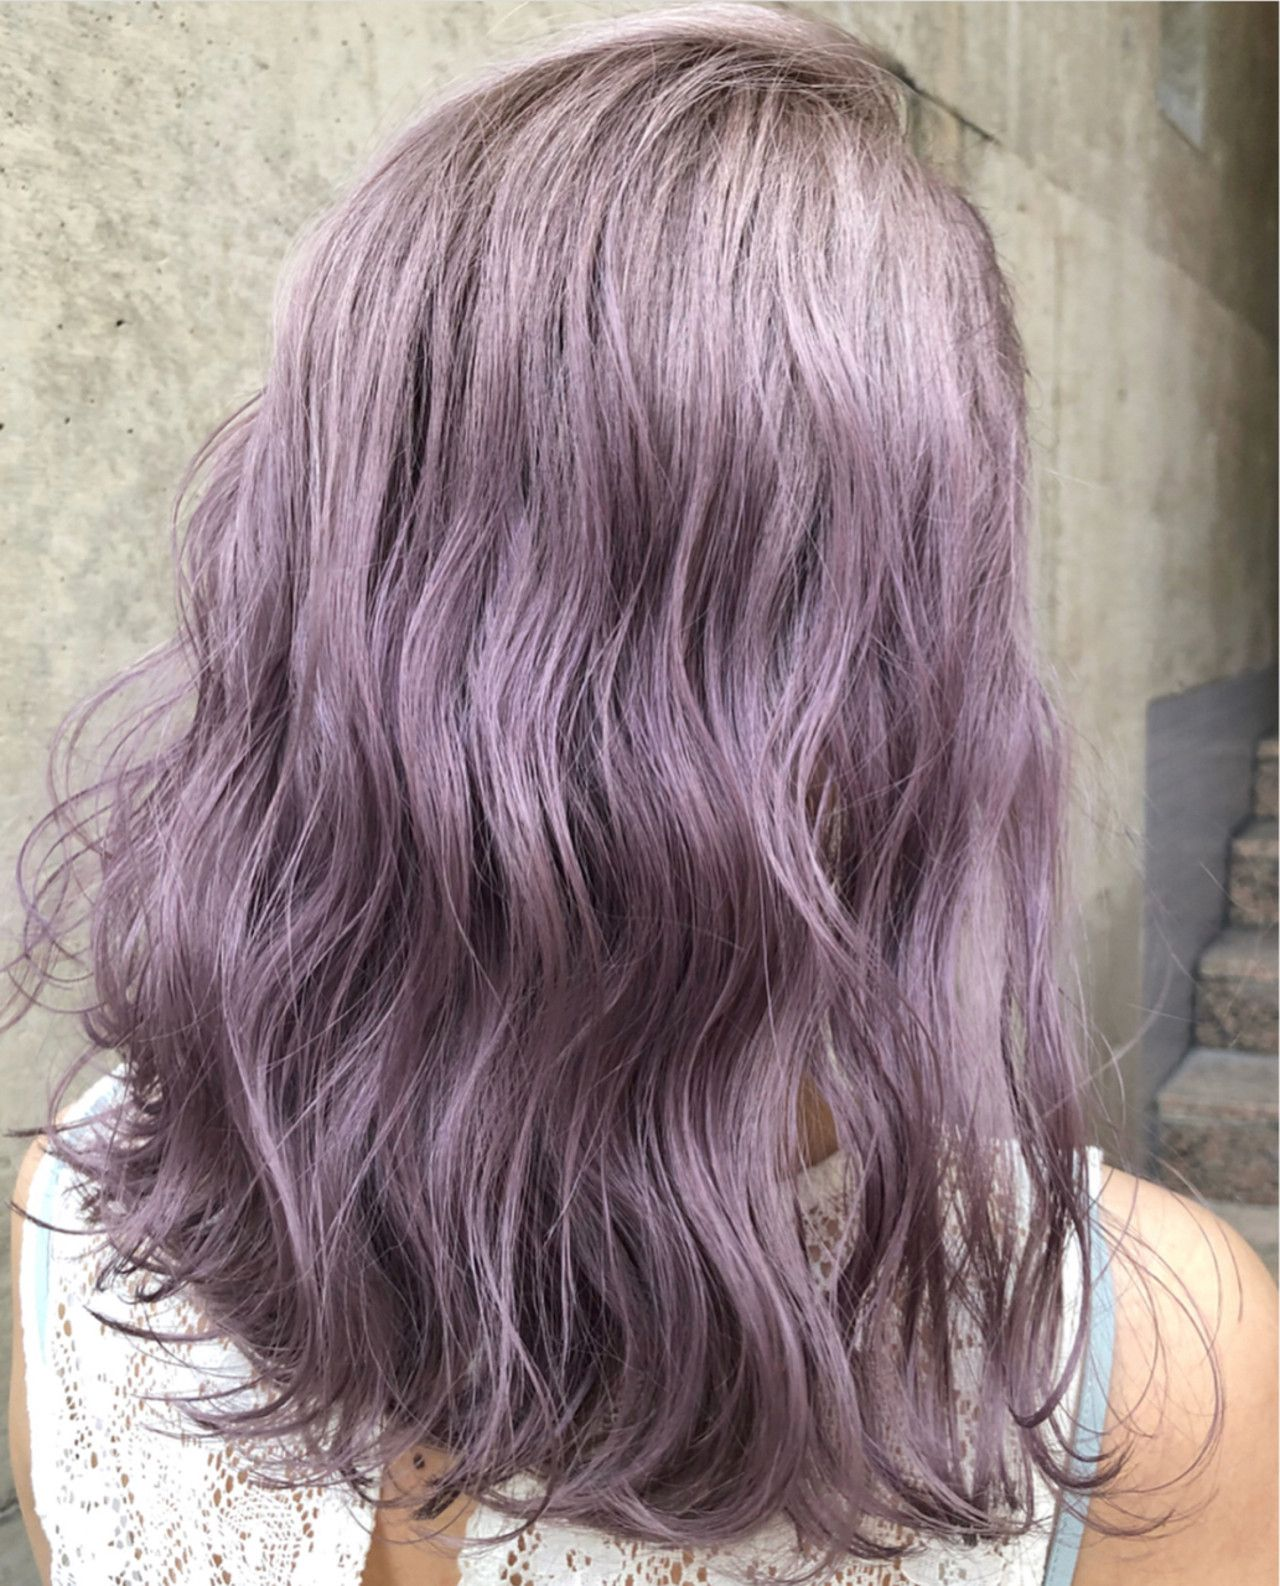 Lavender Pearl 大人気のラベンダーカラー ツヤツヤ透明感